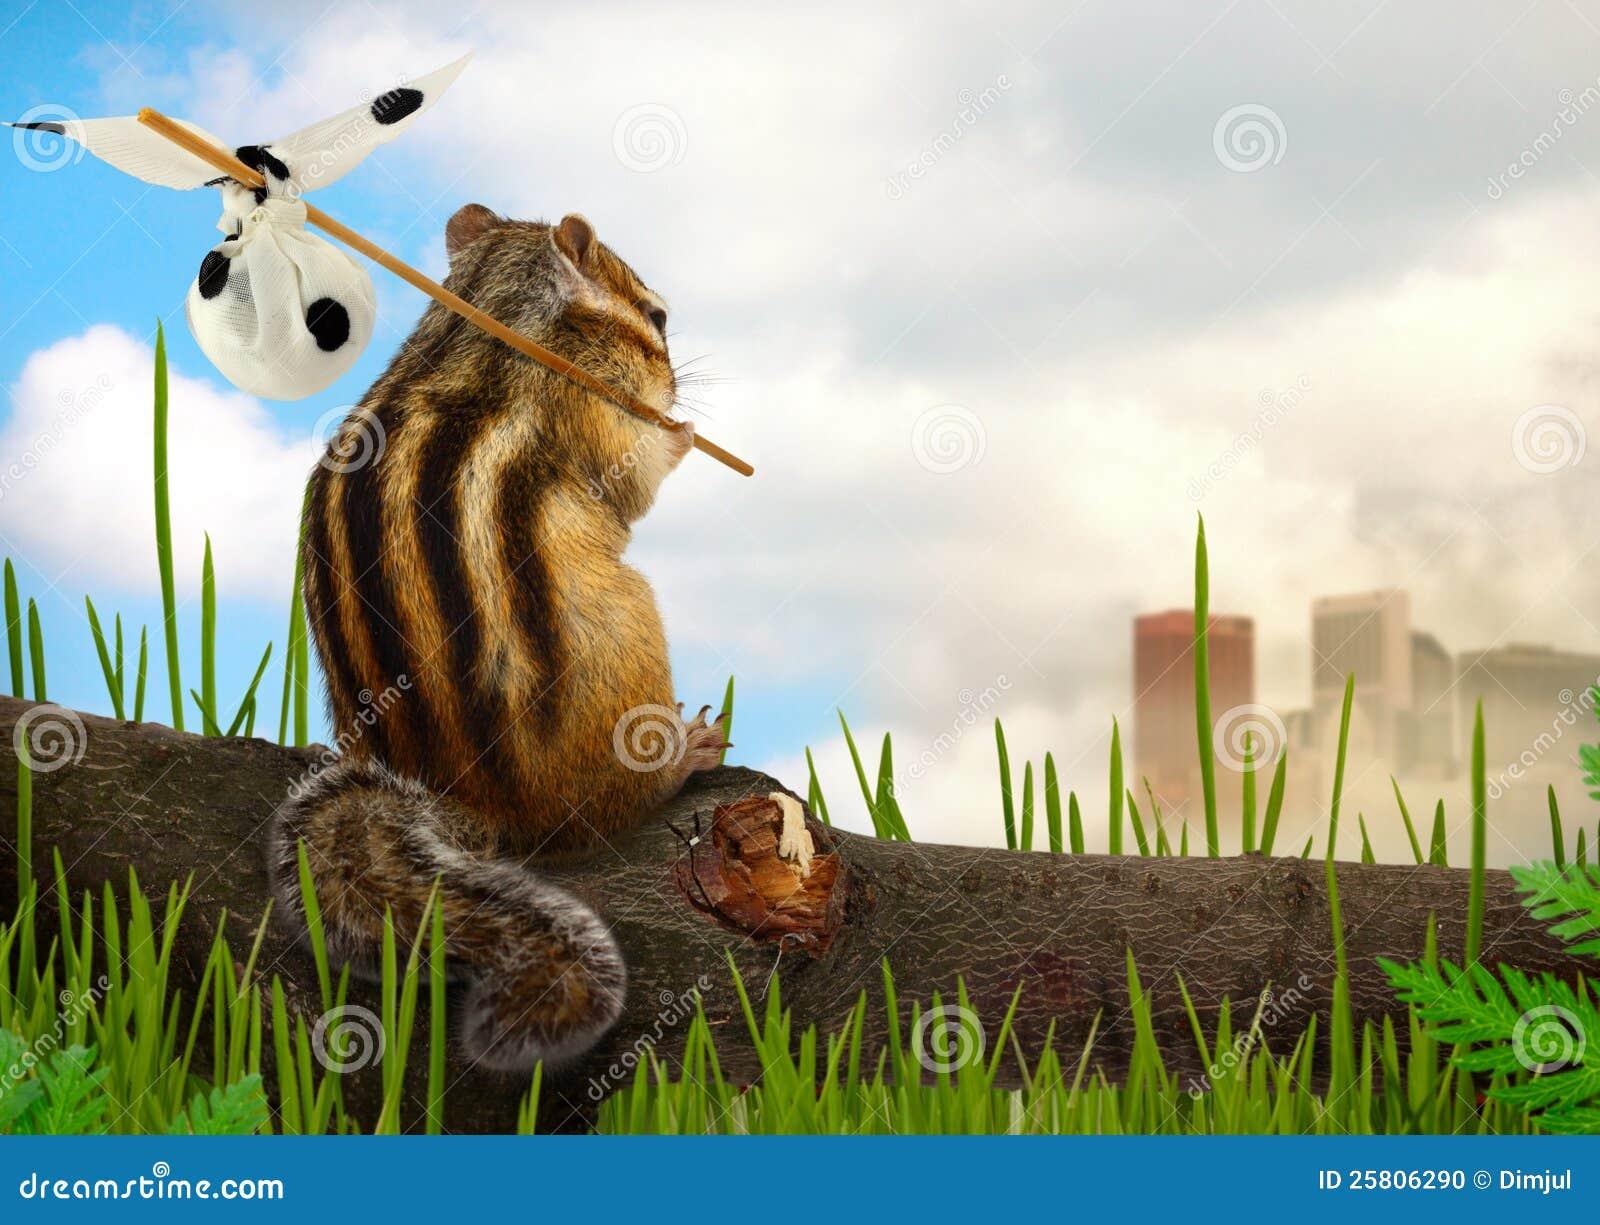 Chipmunk emigrant, ecology concept